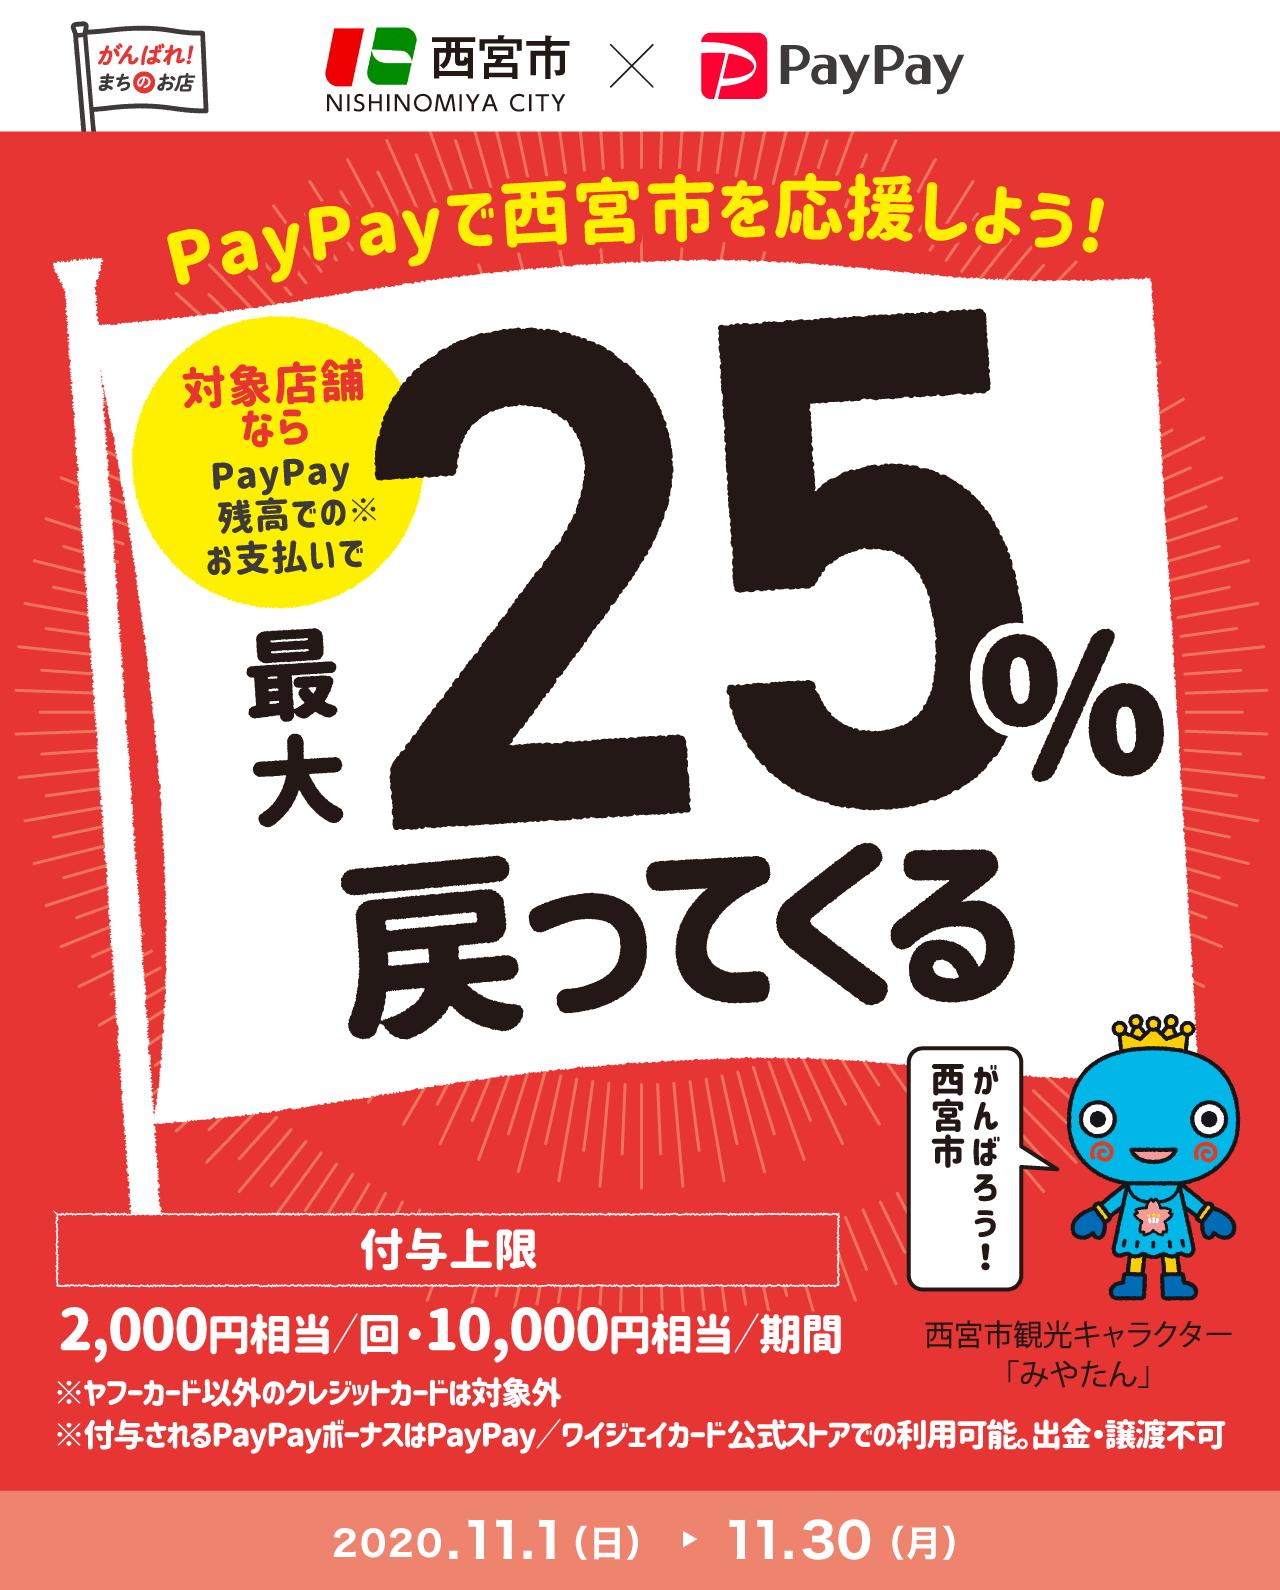 PayPayで西宮市を応援しよう!対象店舗ならPayPay残高でのお支払いで最大25%戻ってくる